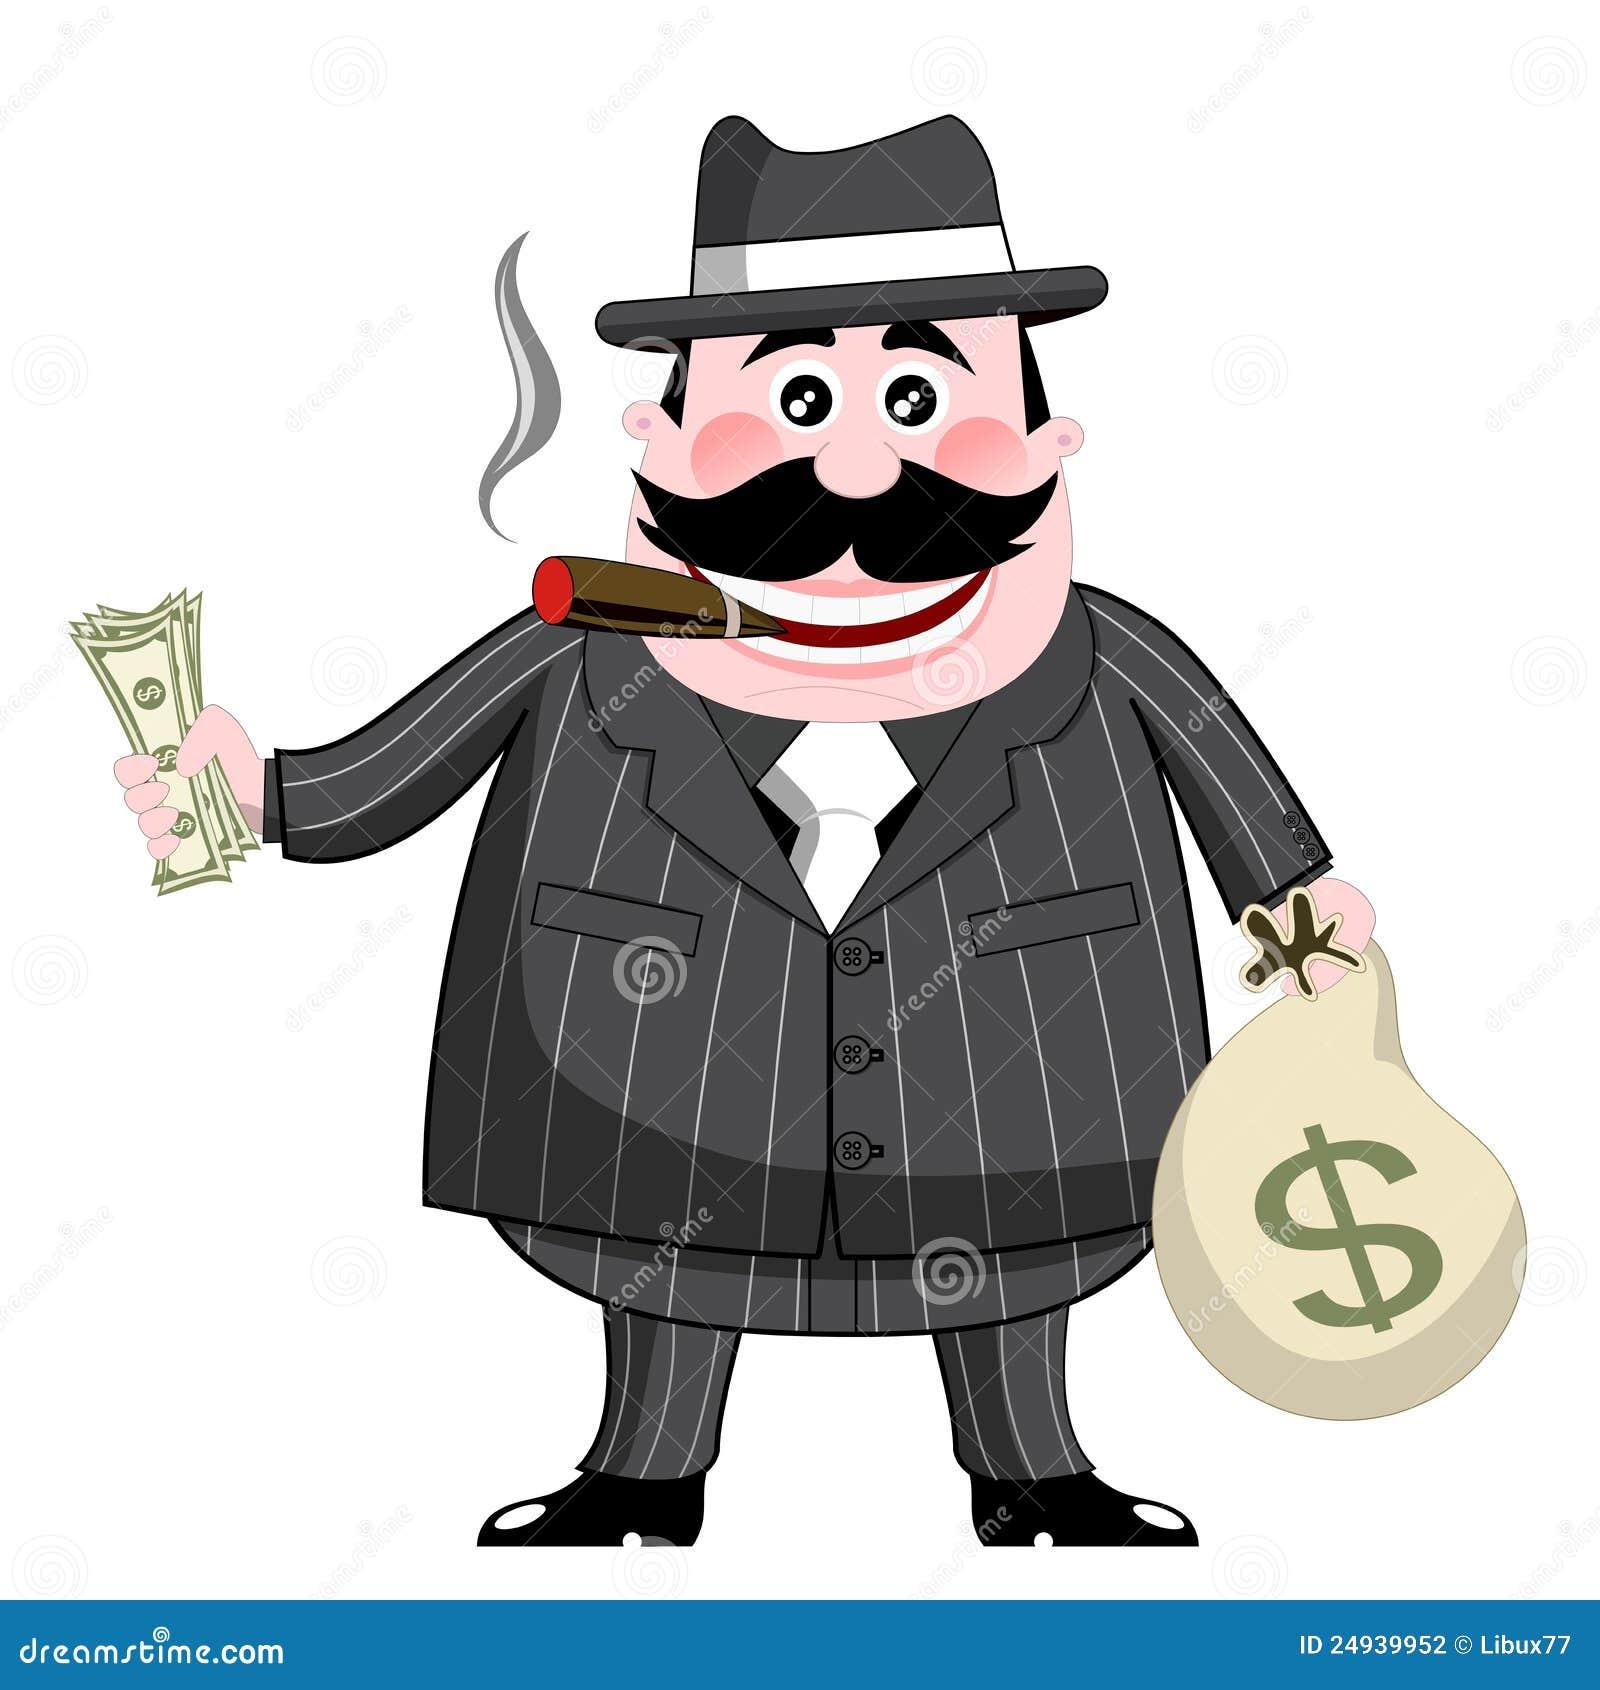 cartoon gangster isolated money cigar fat stock illustration rh dreamstime com gangster cartoon images free Gangster Looney Tunes